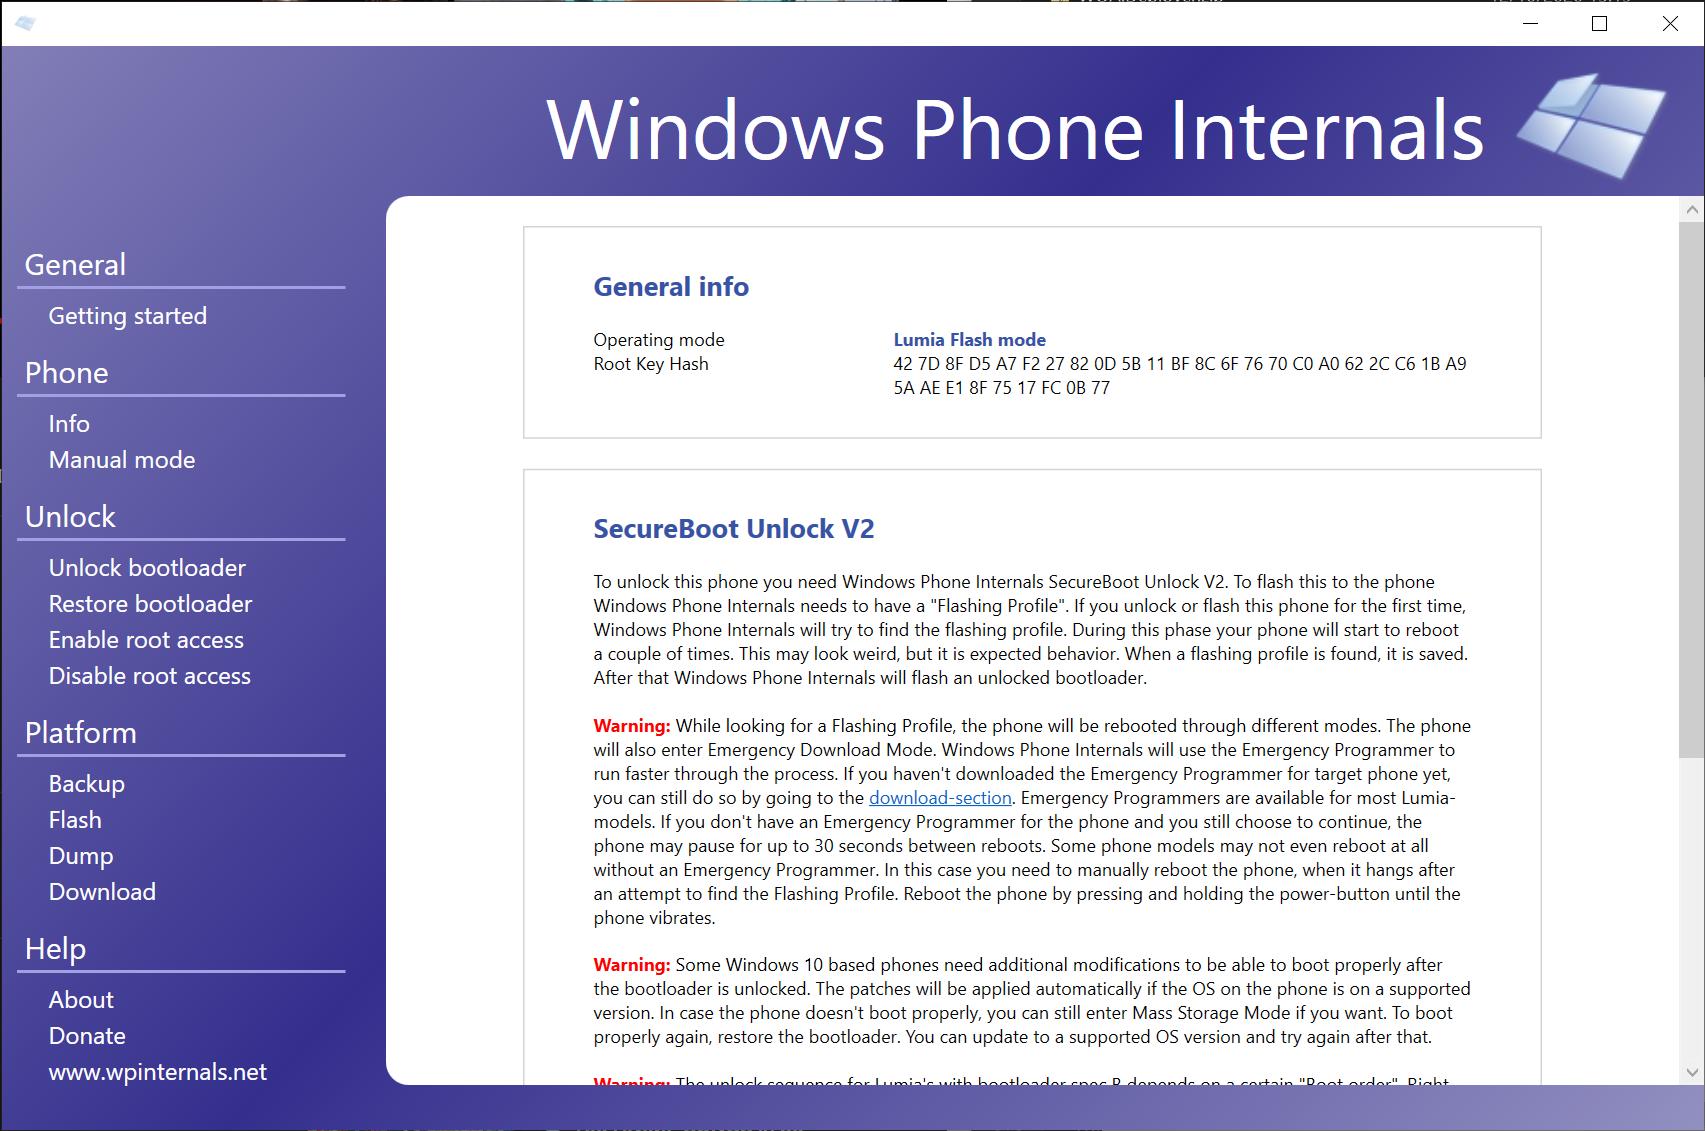 The WPInternals unlock page